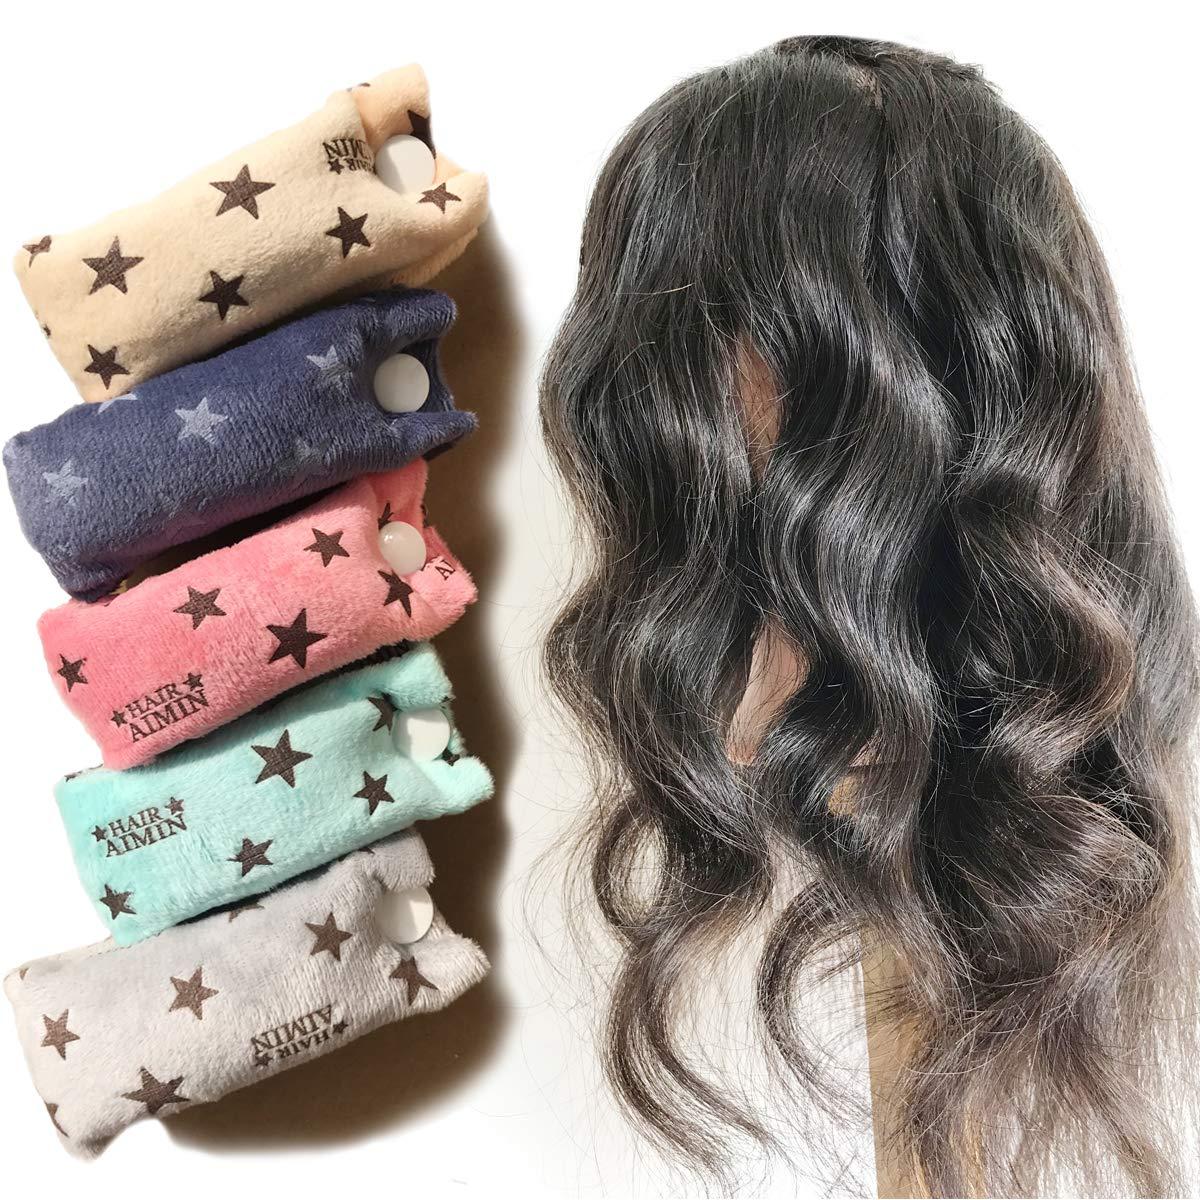 Aimin Hair Soft Light Rollers Sleep Sponge Hair Curler Foam Hair Styling Rollers